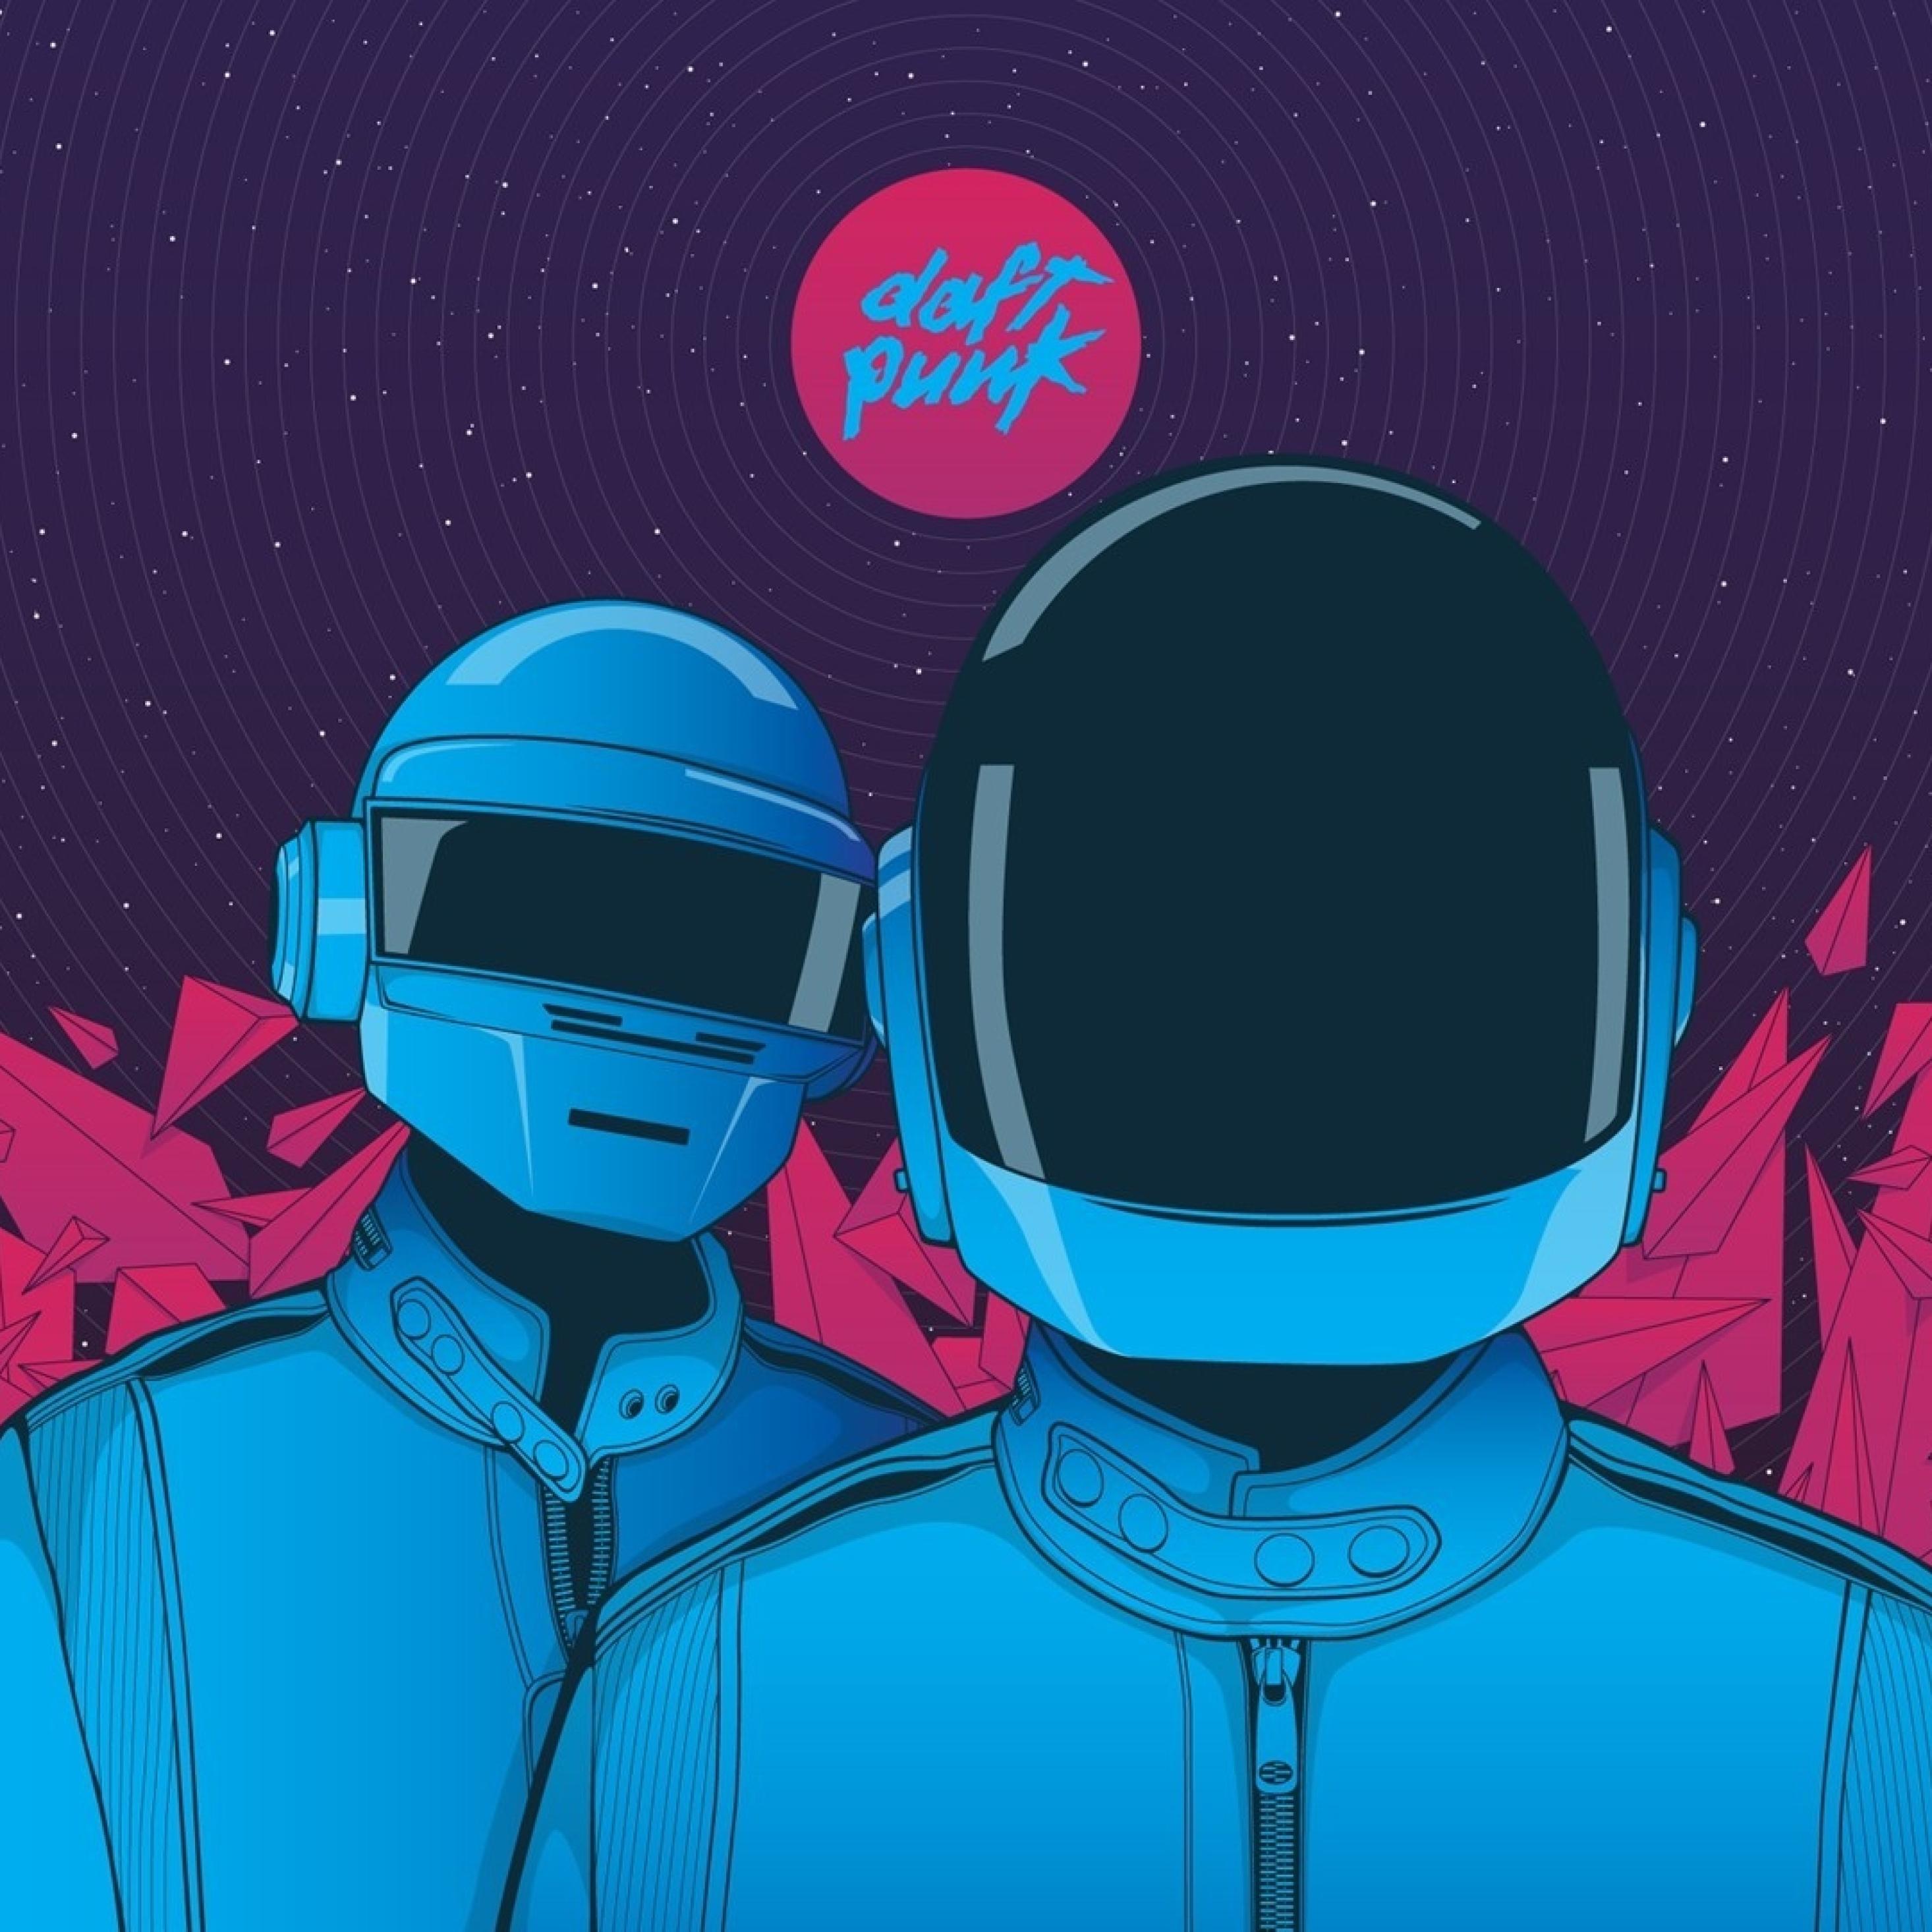 Punk Wallpaper: Daft Punk, Graphic, Helmet, Full HD Wallpaper